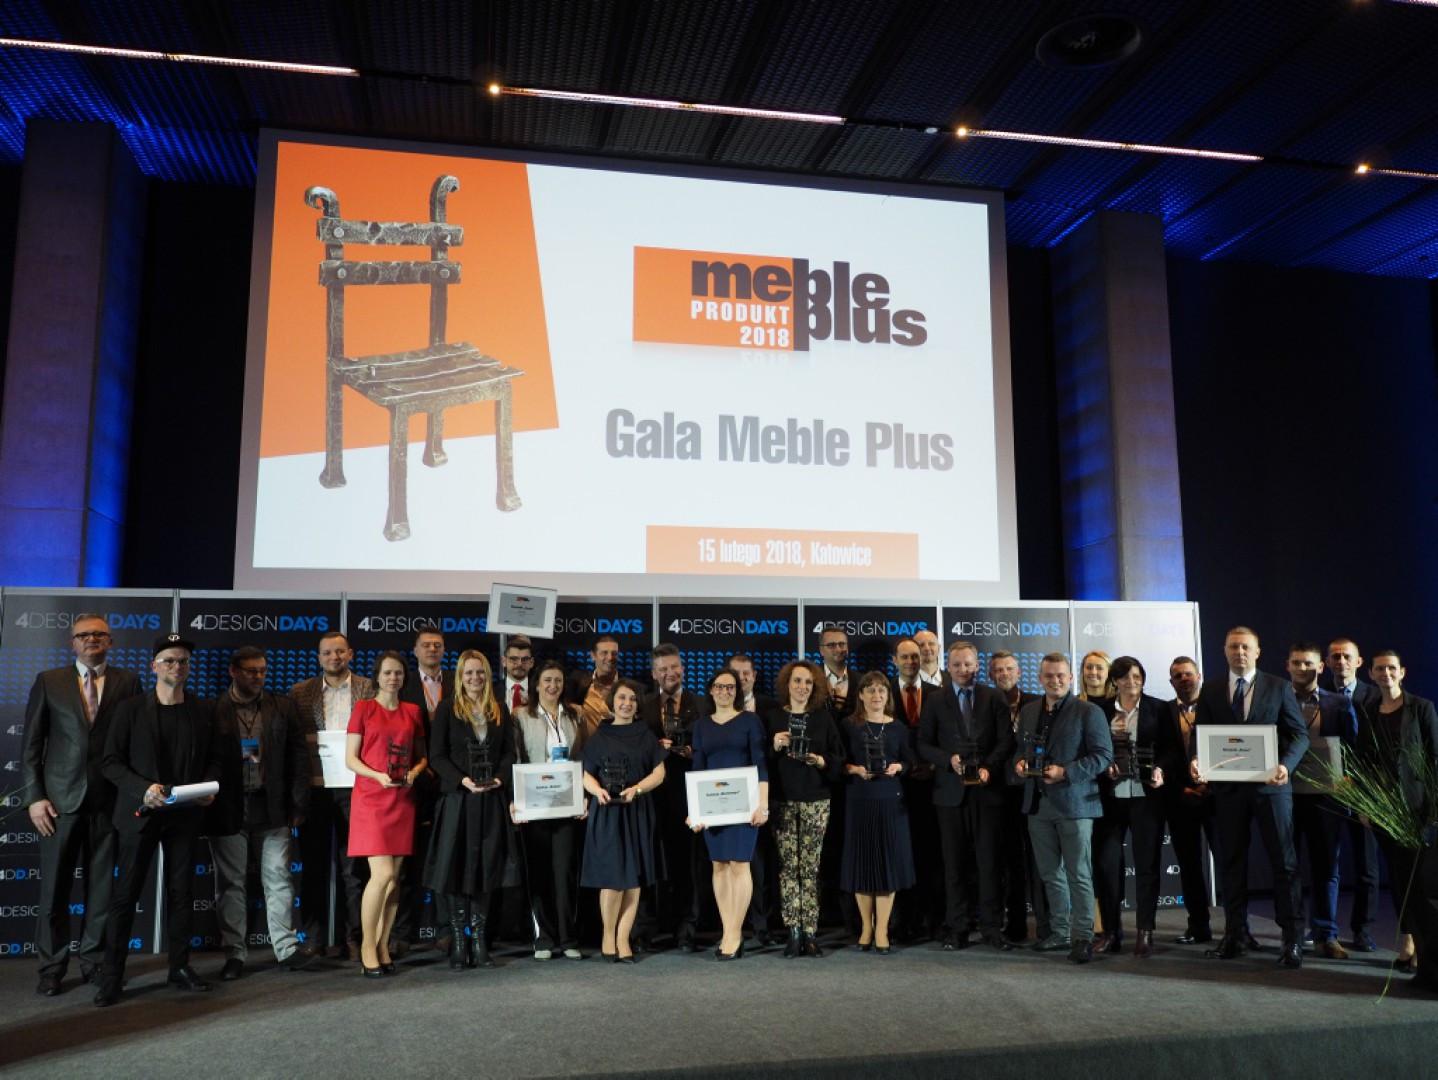 Laureaci konkursu Meble Plus - Produkt 2018 podczas uroczystej gali na 4 Design Days. Fot. PTWP